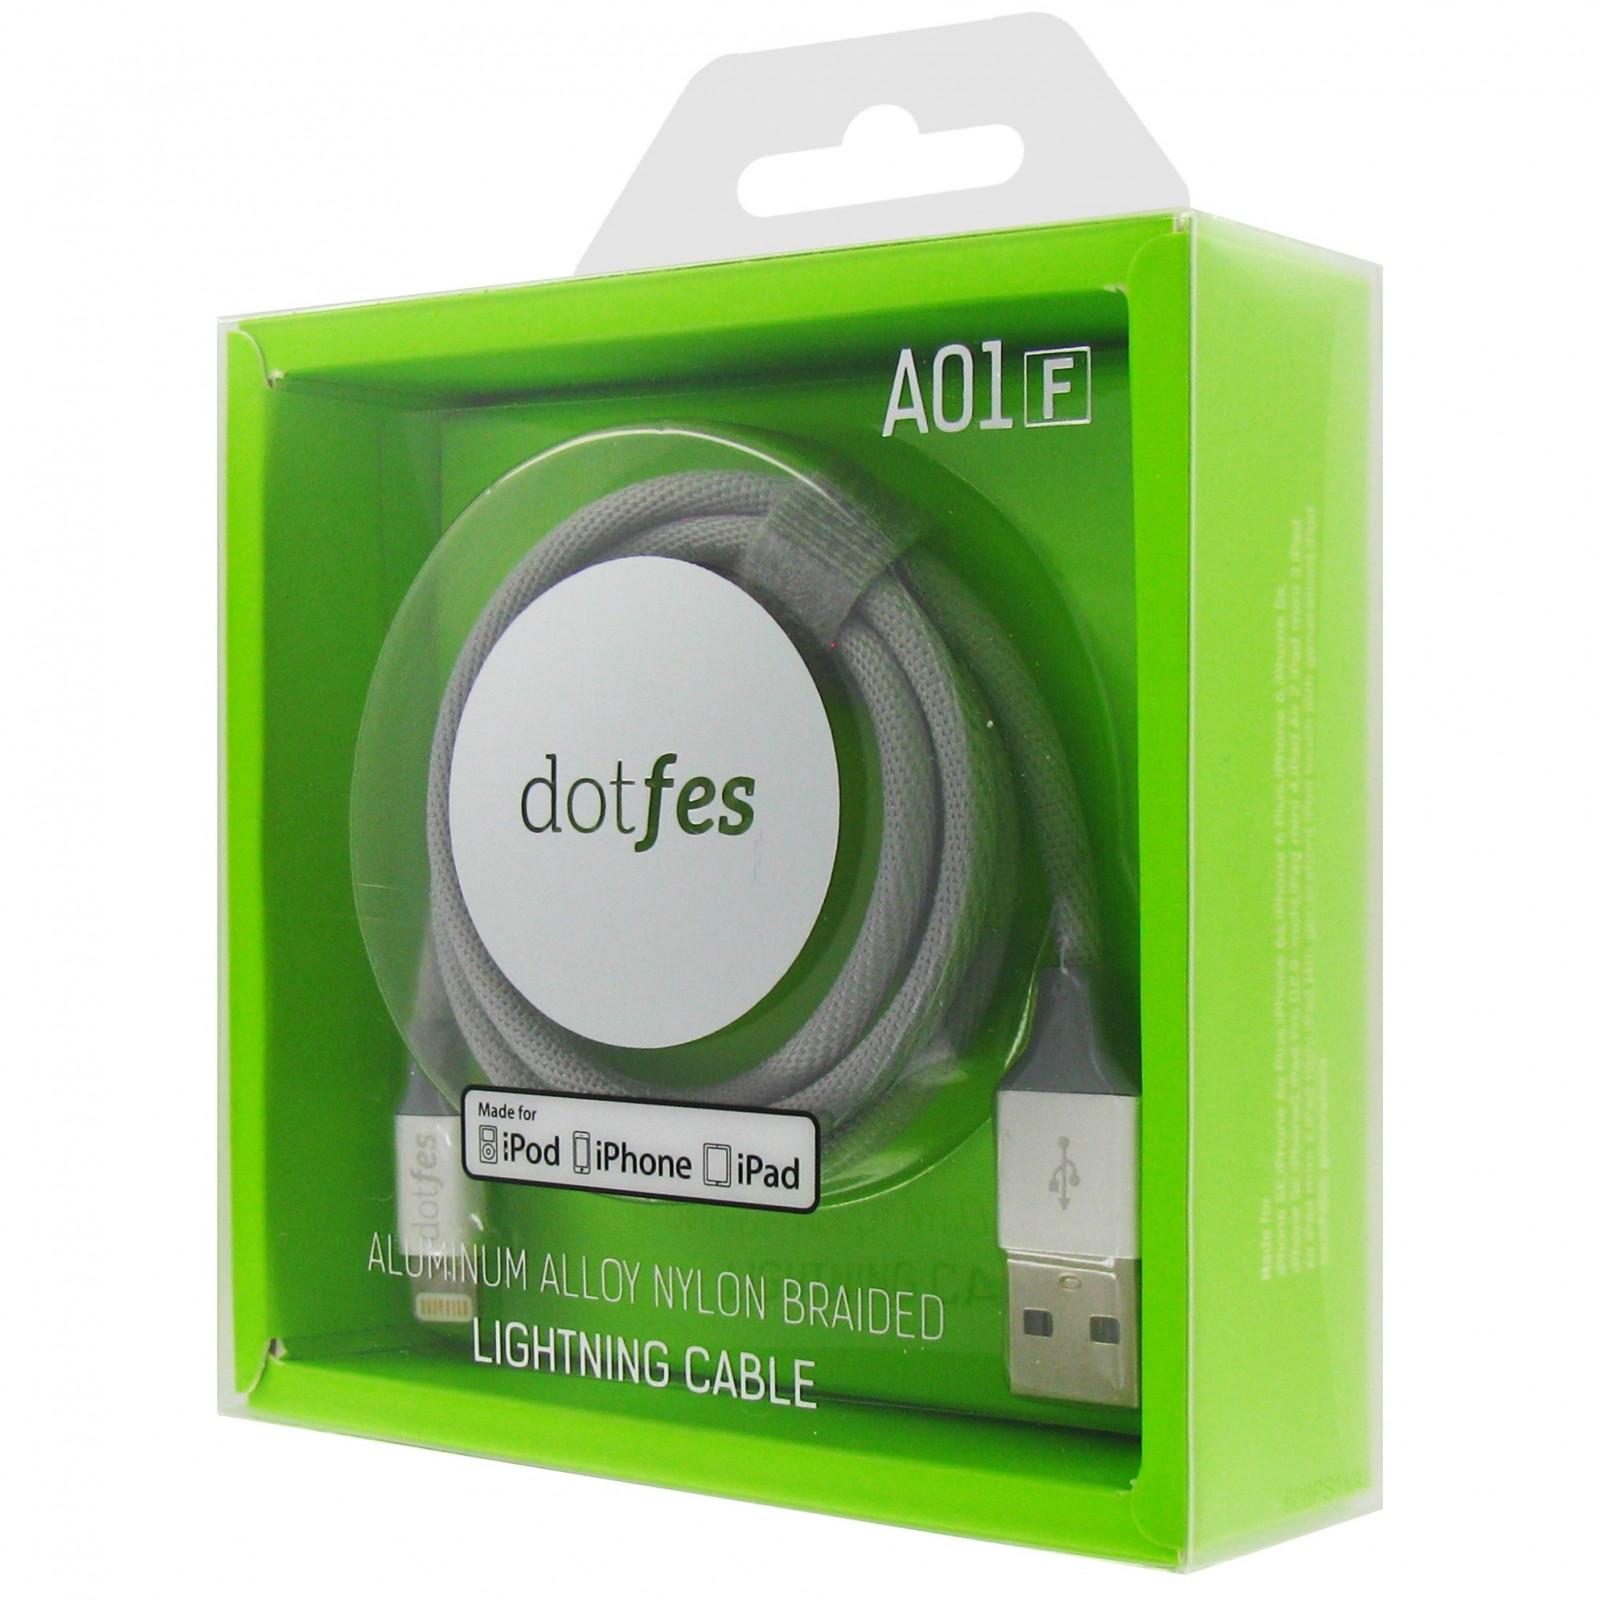 USB кабель Dotfes A01F Lightning MFI (1m), gray аксессуар dotfes usb lightning mfi a01f 2 5a 1m grey 14601